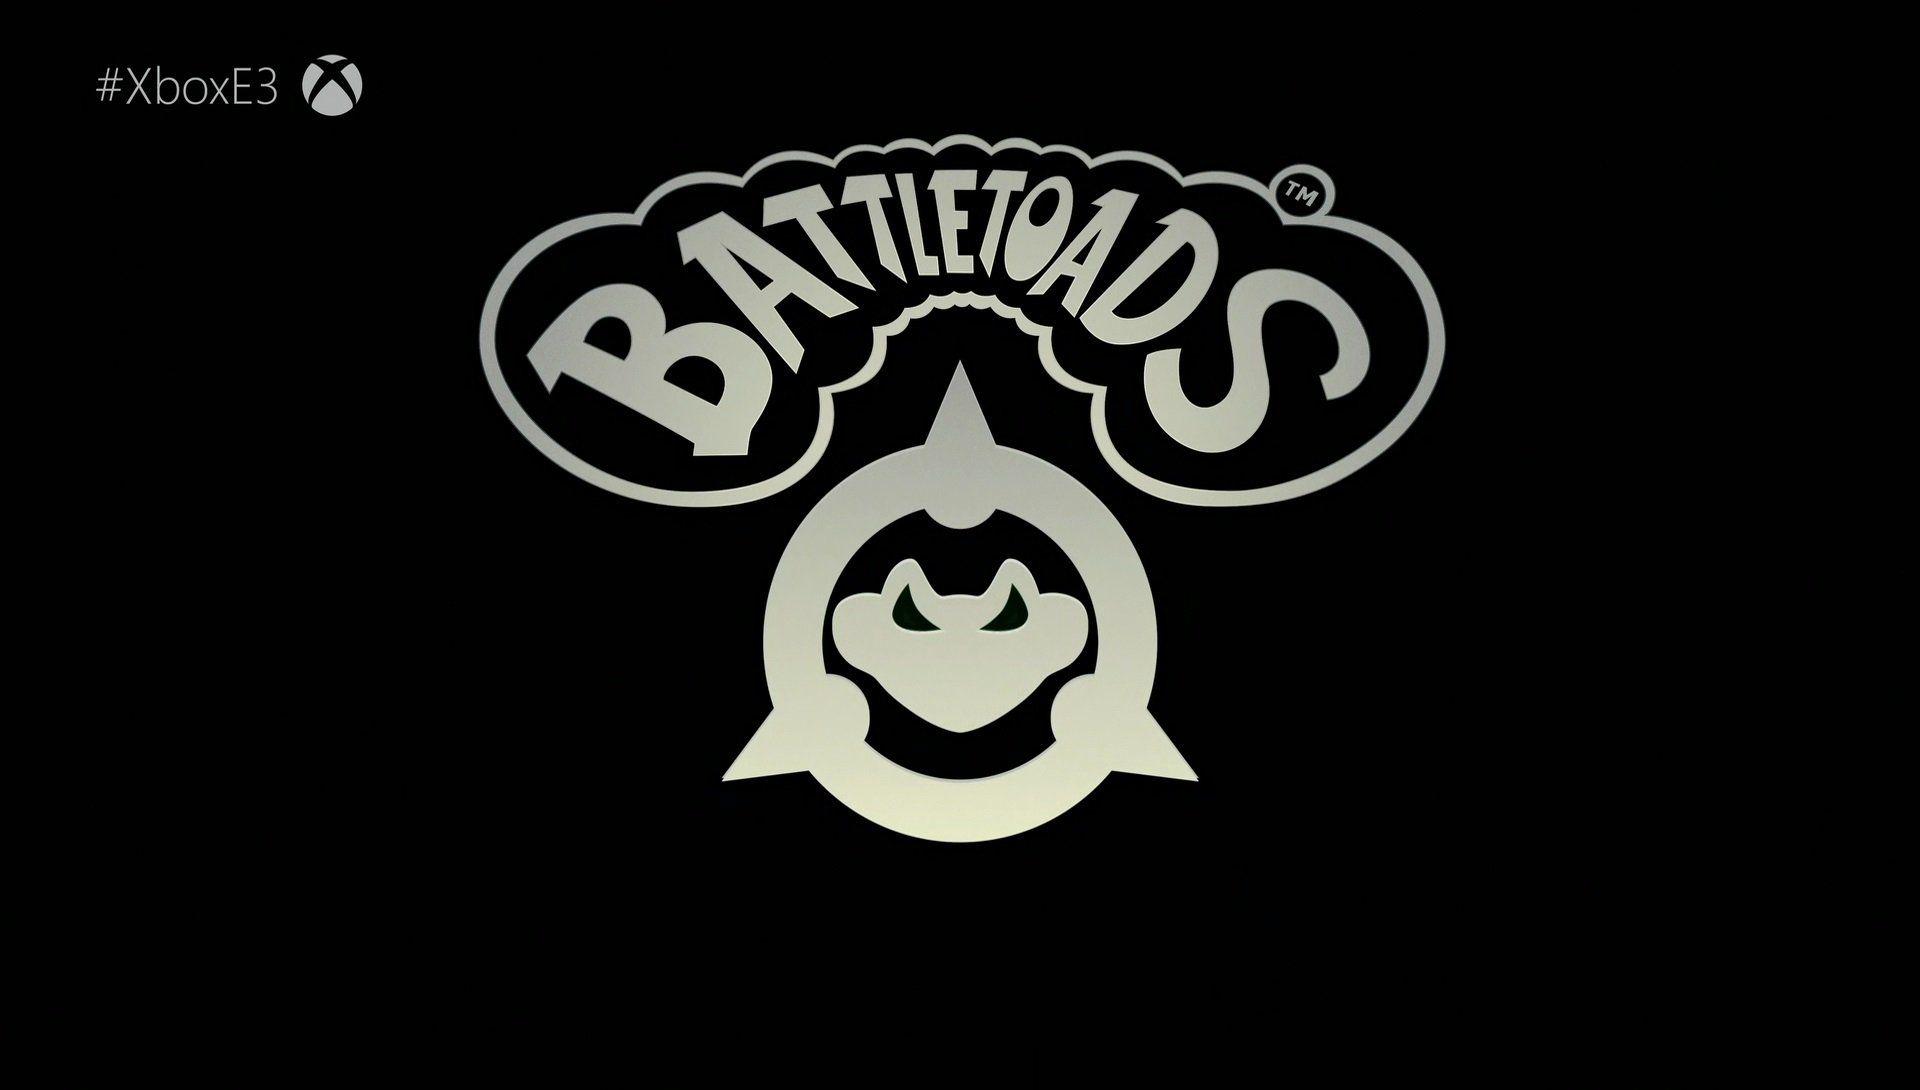 Microsoft E3 2018: Battletoads | Gaming Articles | Pinterest